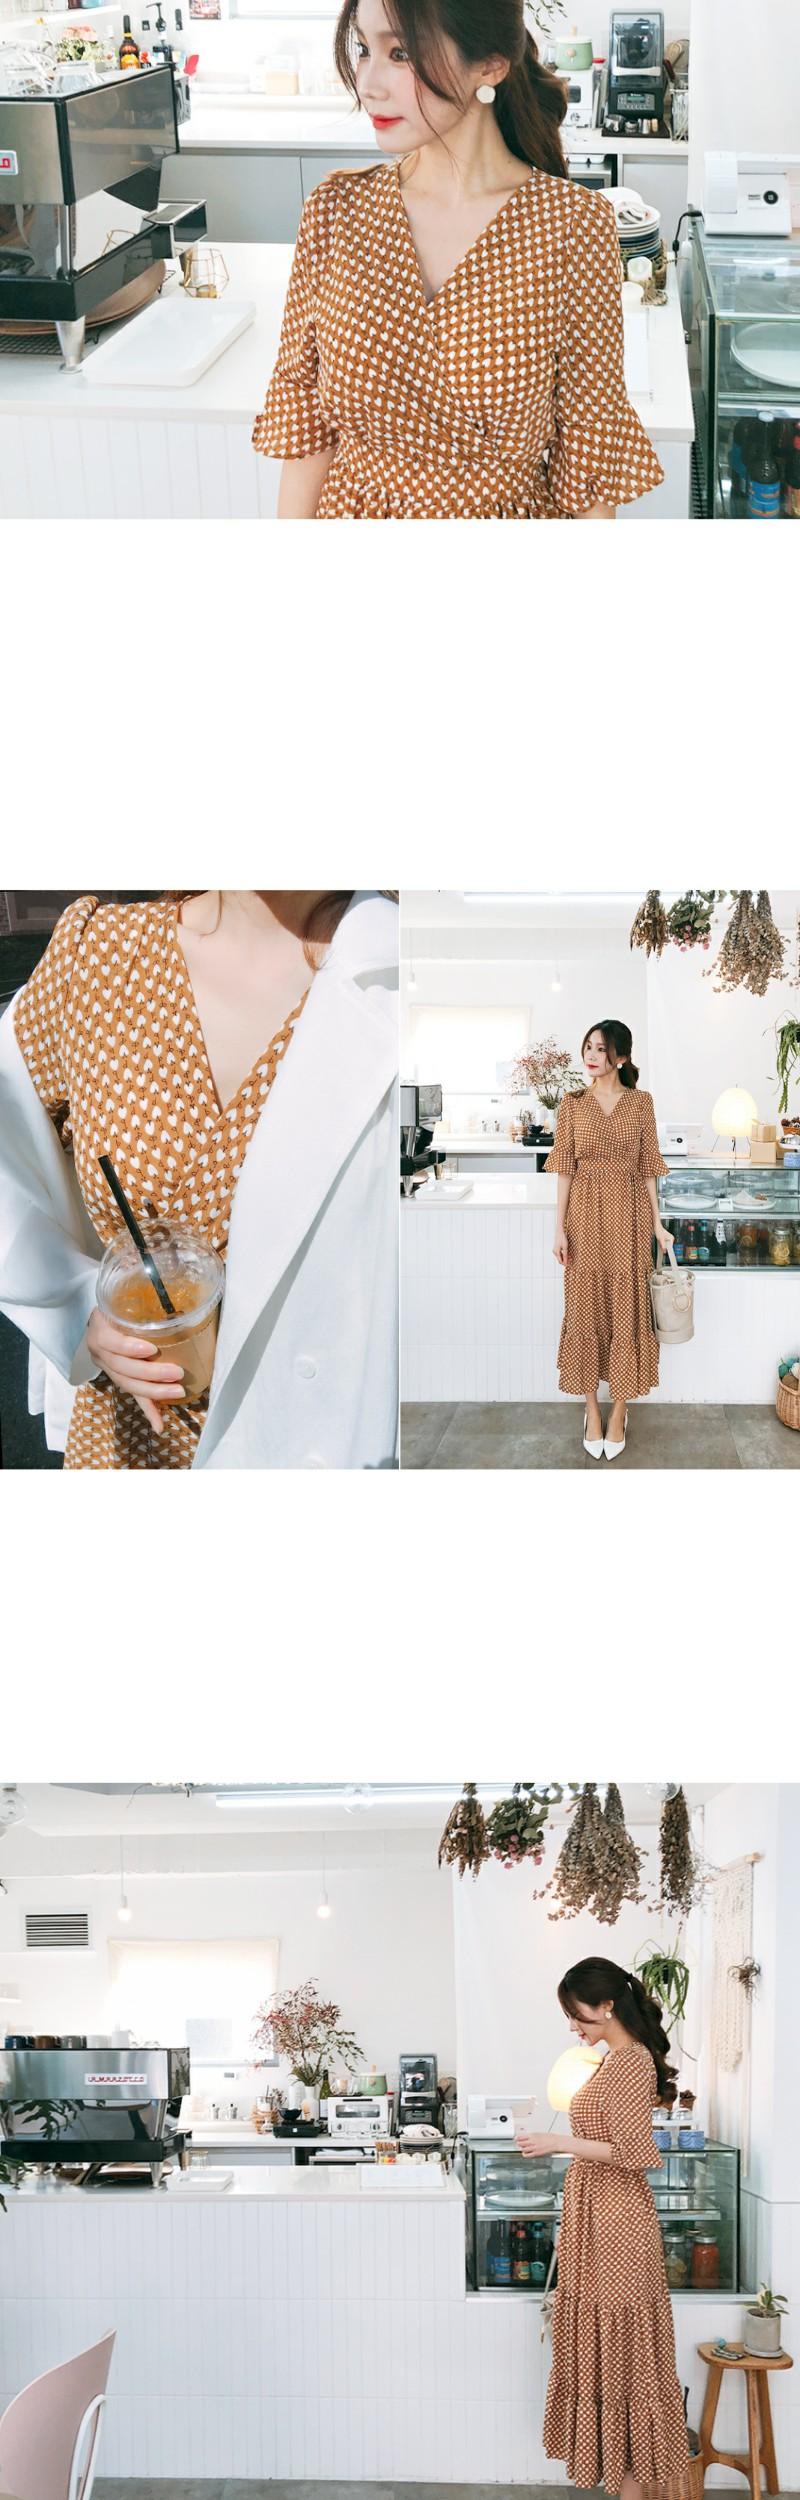 Aura cane dress